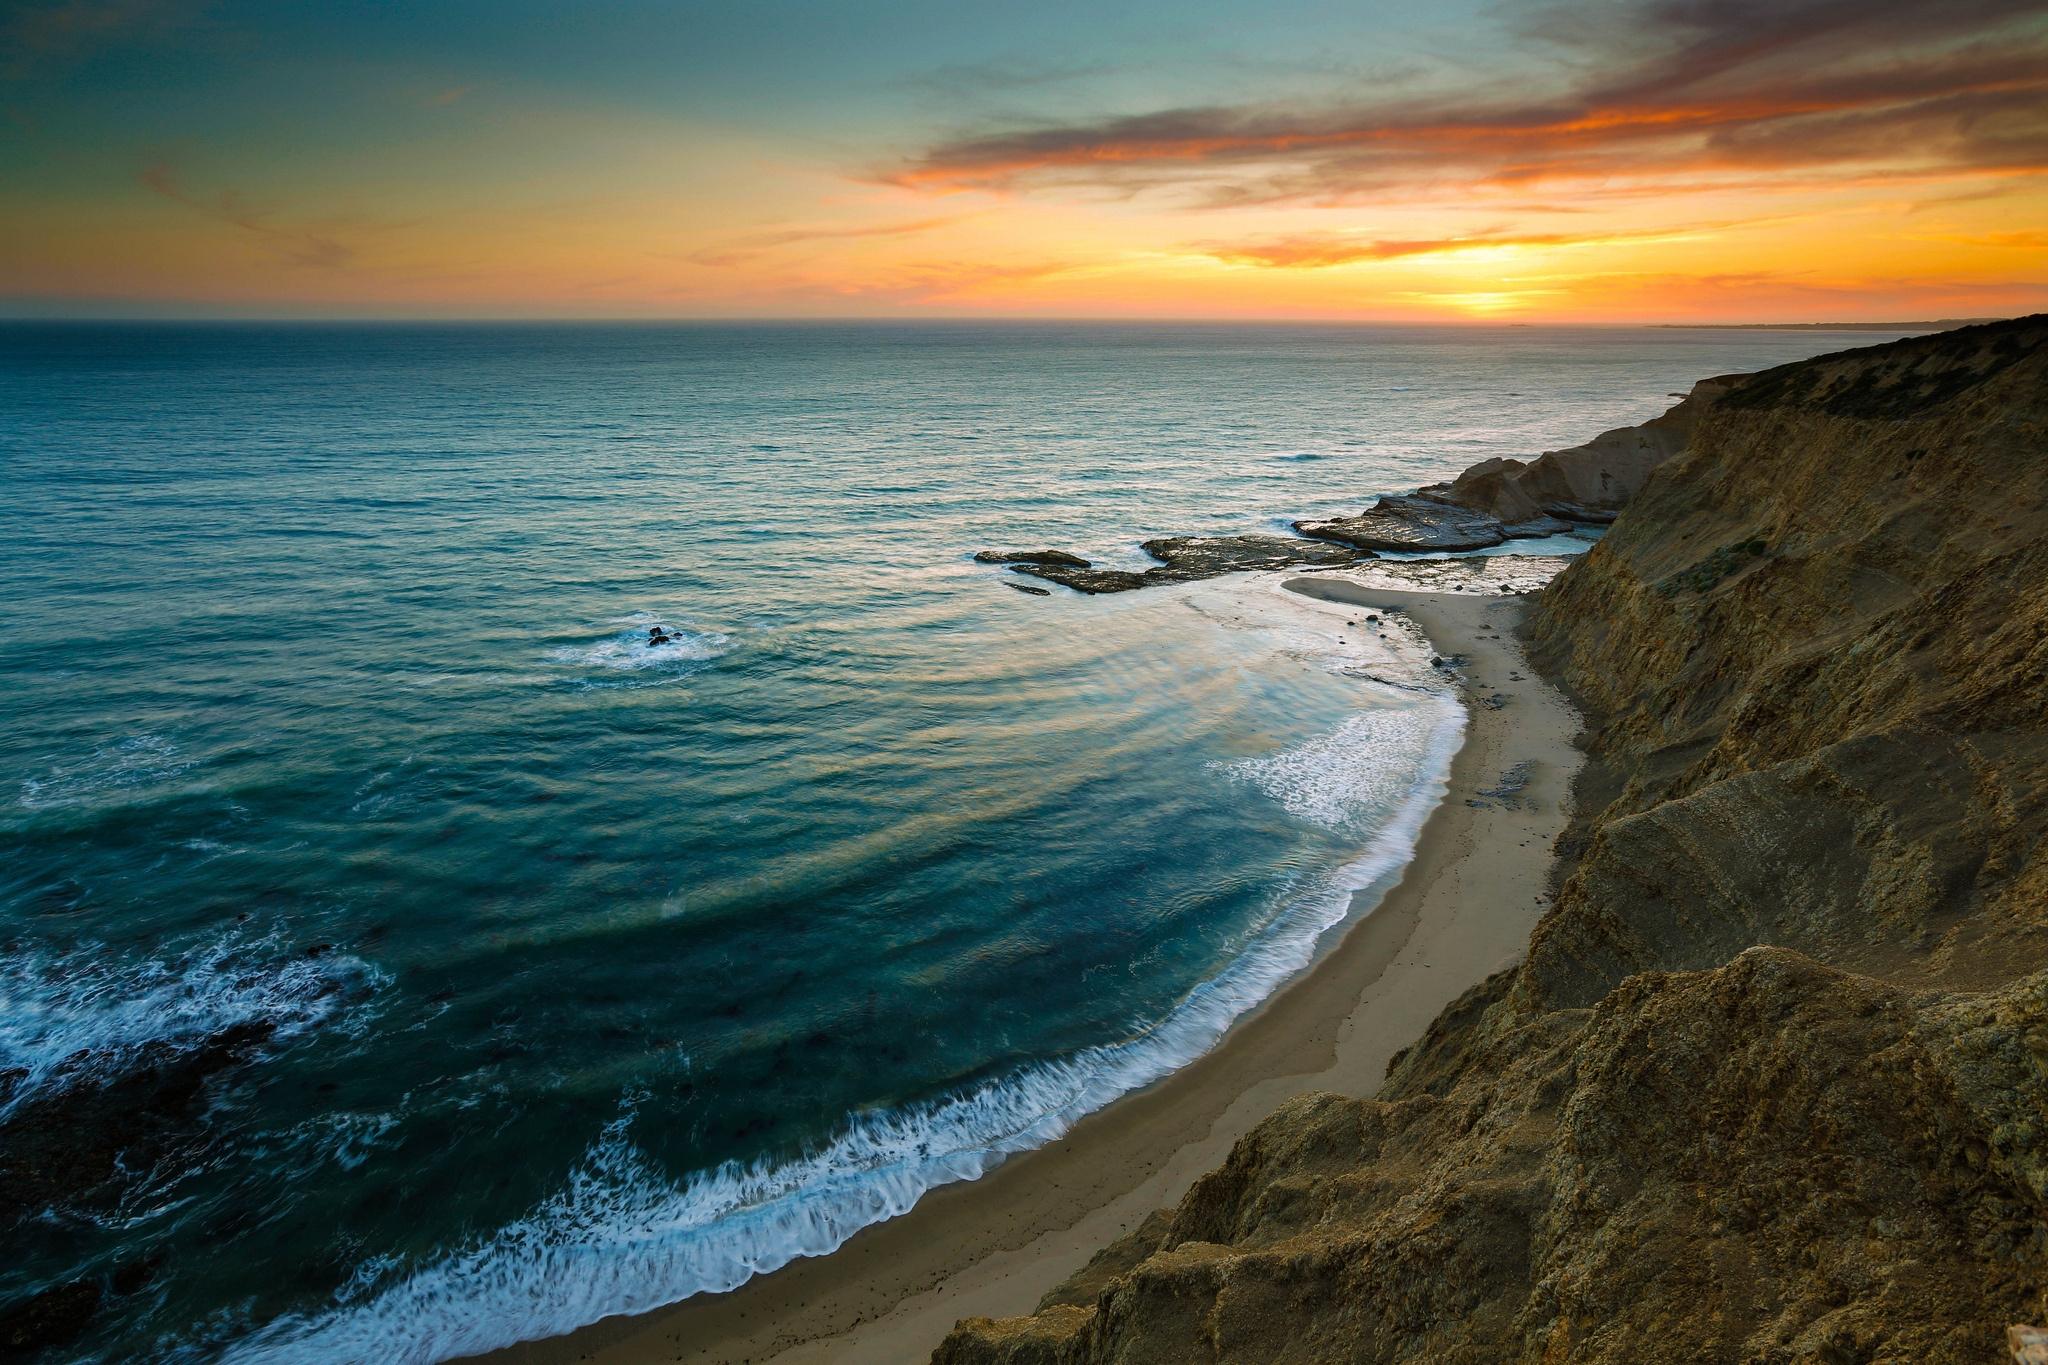 coast_sea_height_surf_rocks_hd-wallpaper-44921